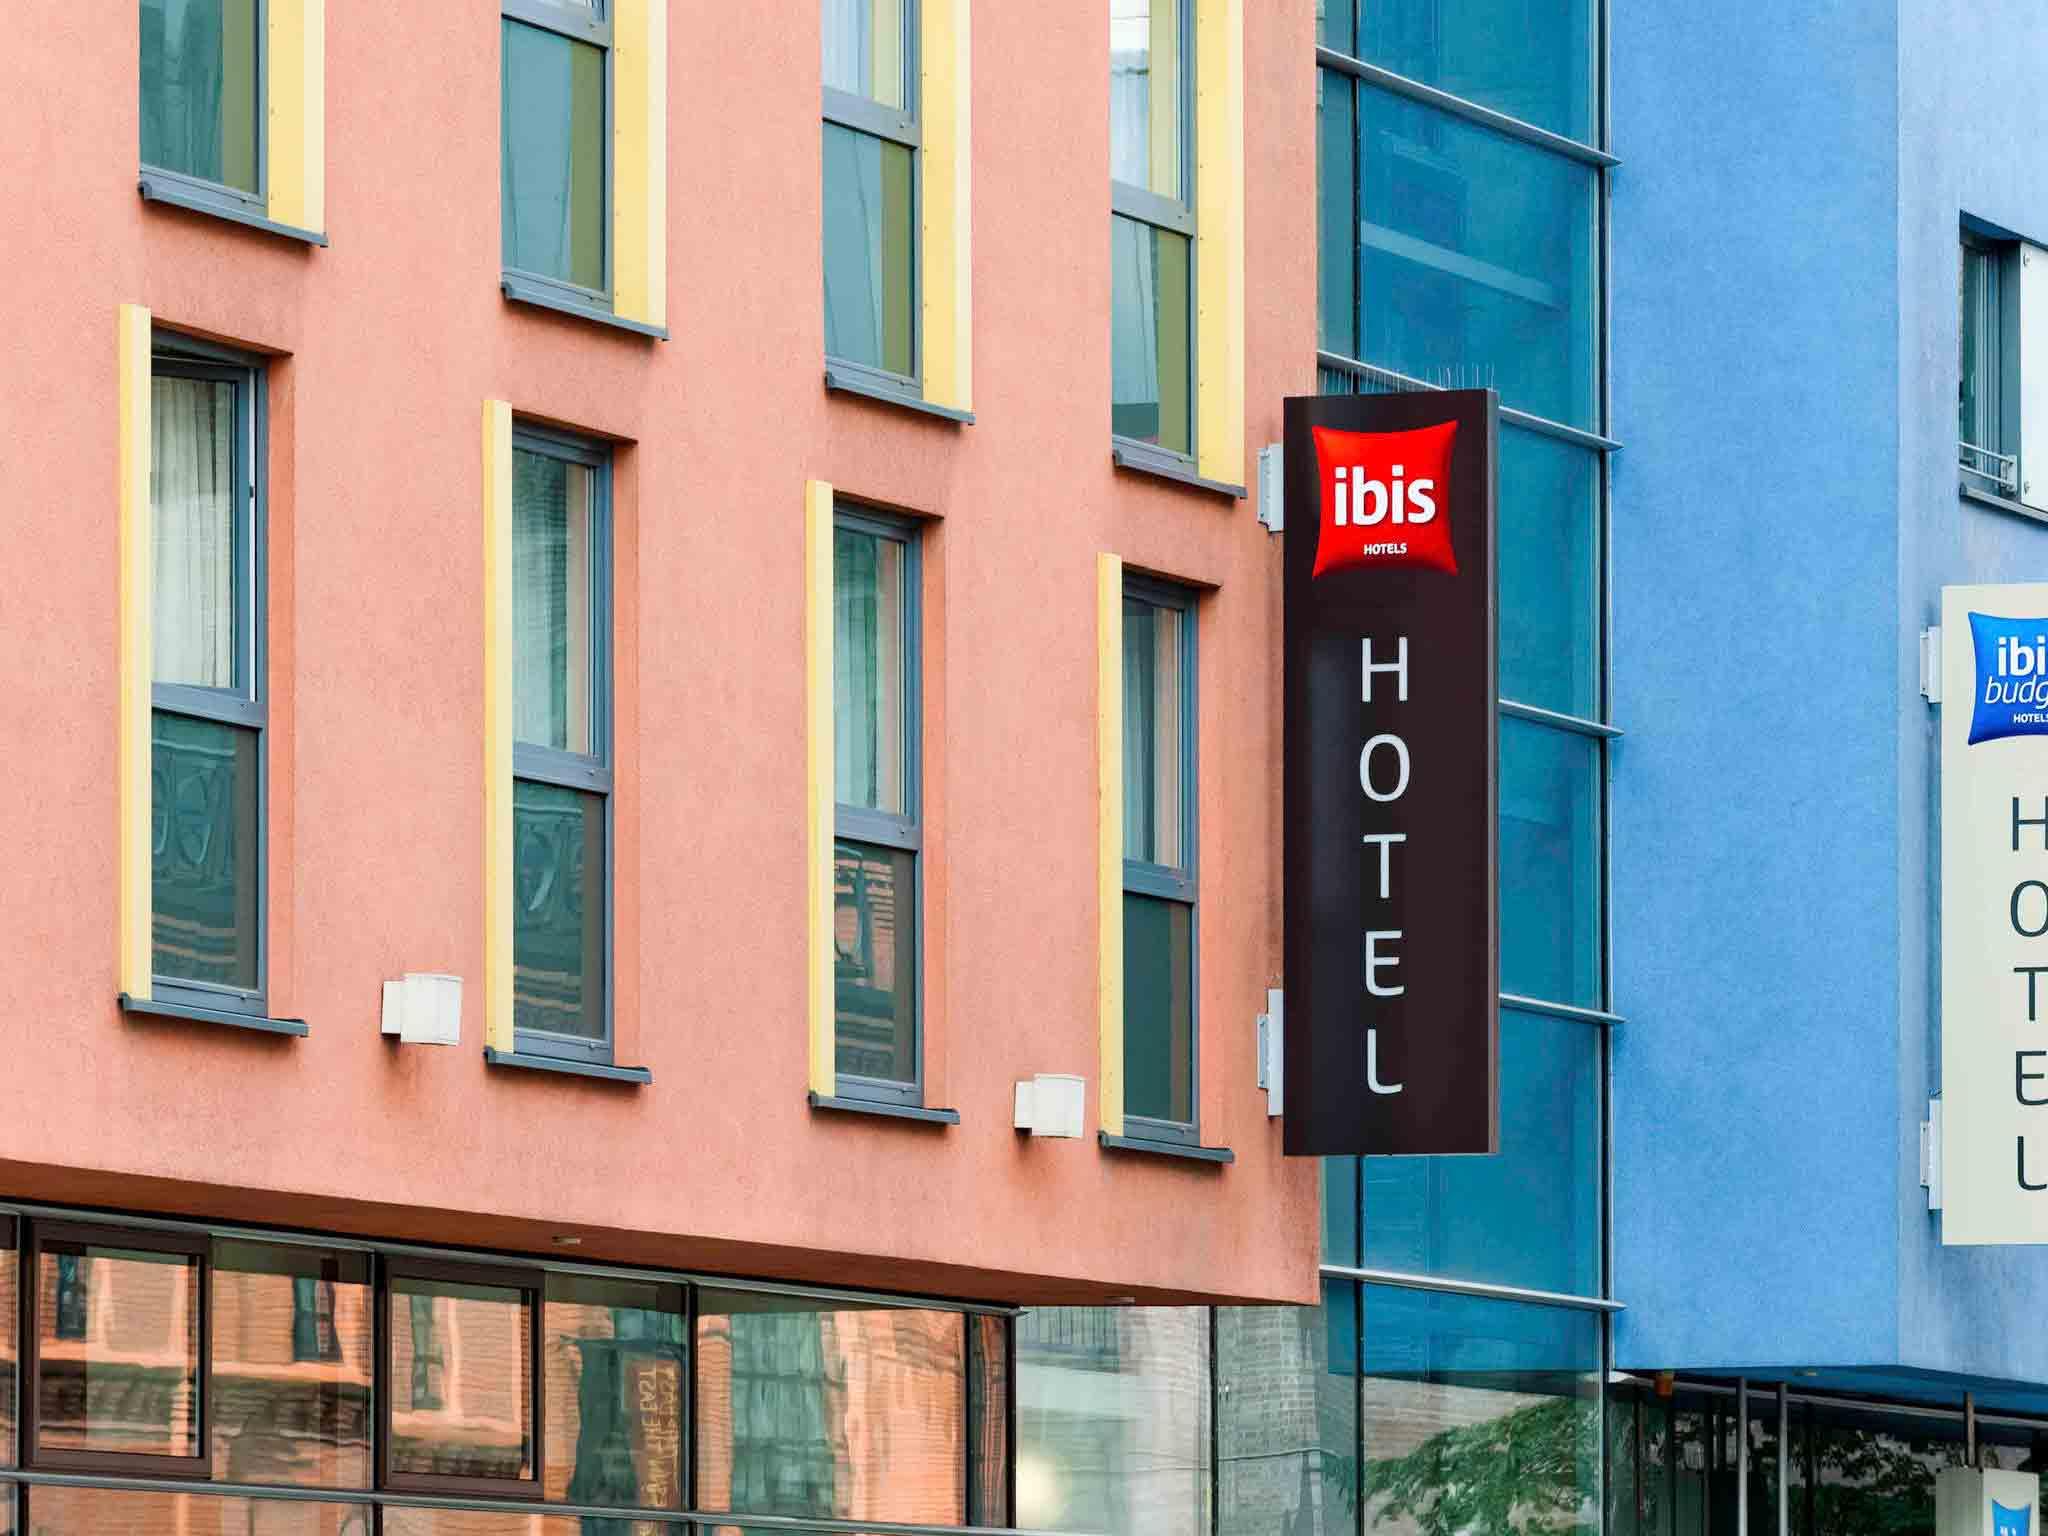 Hotel ibis Hamburg St. Pauli Messe. Book online now!